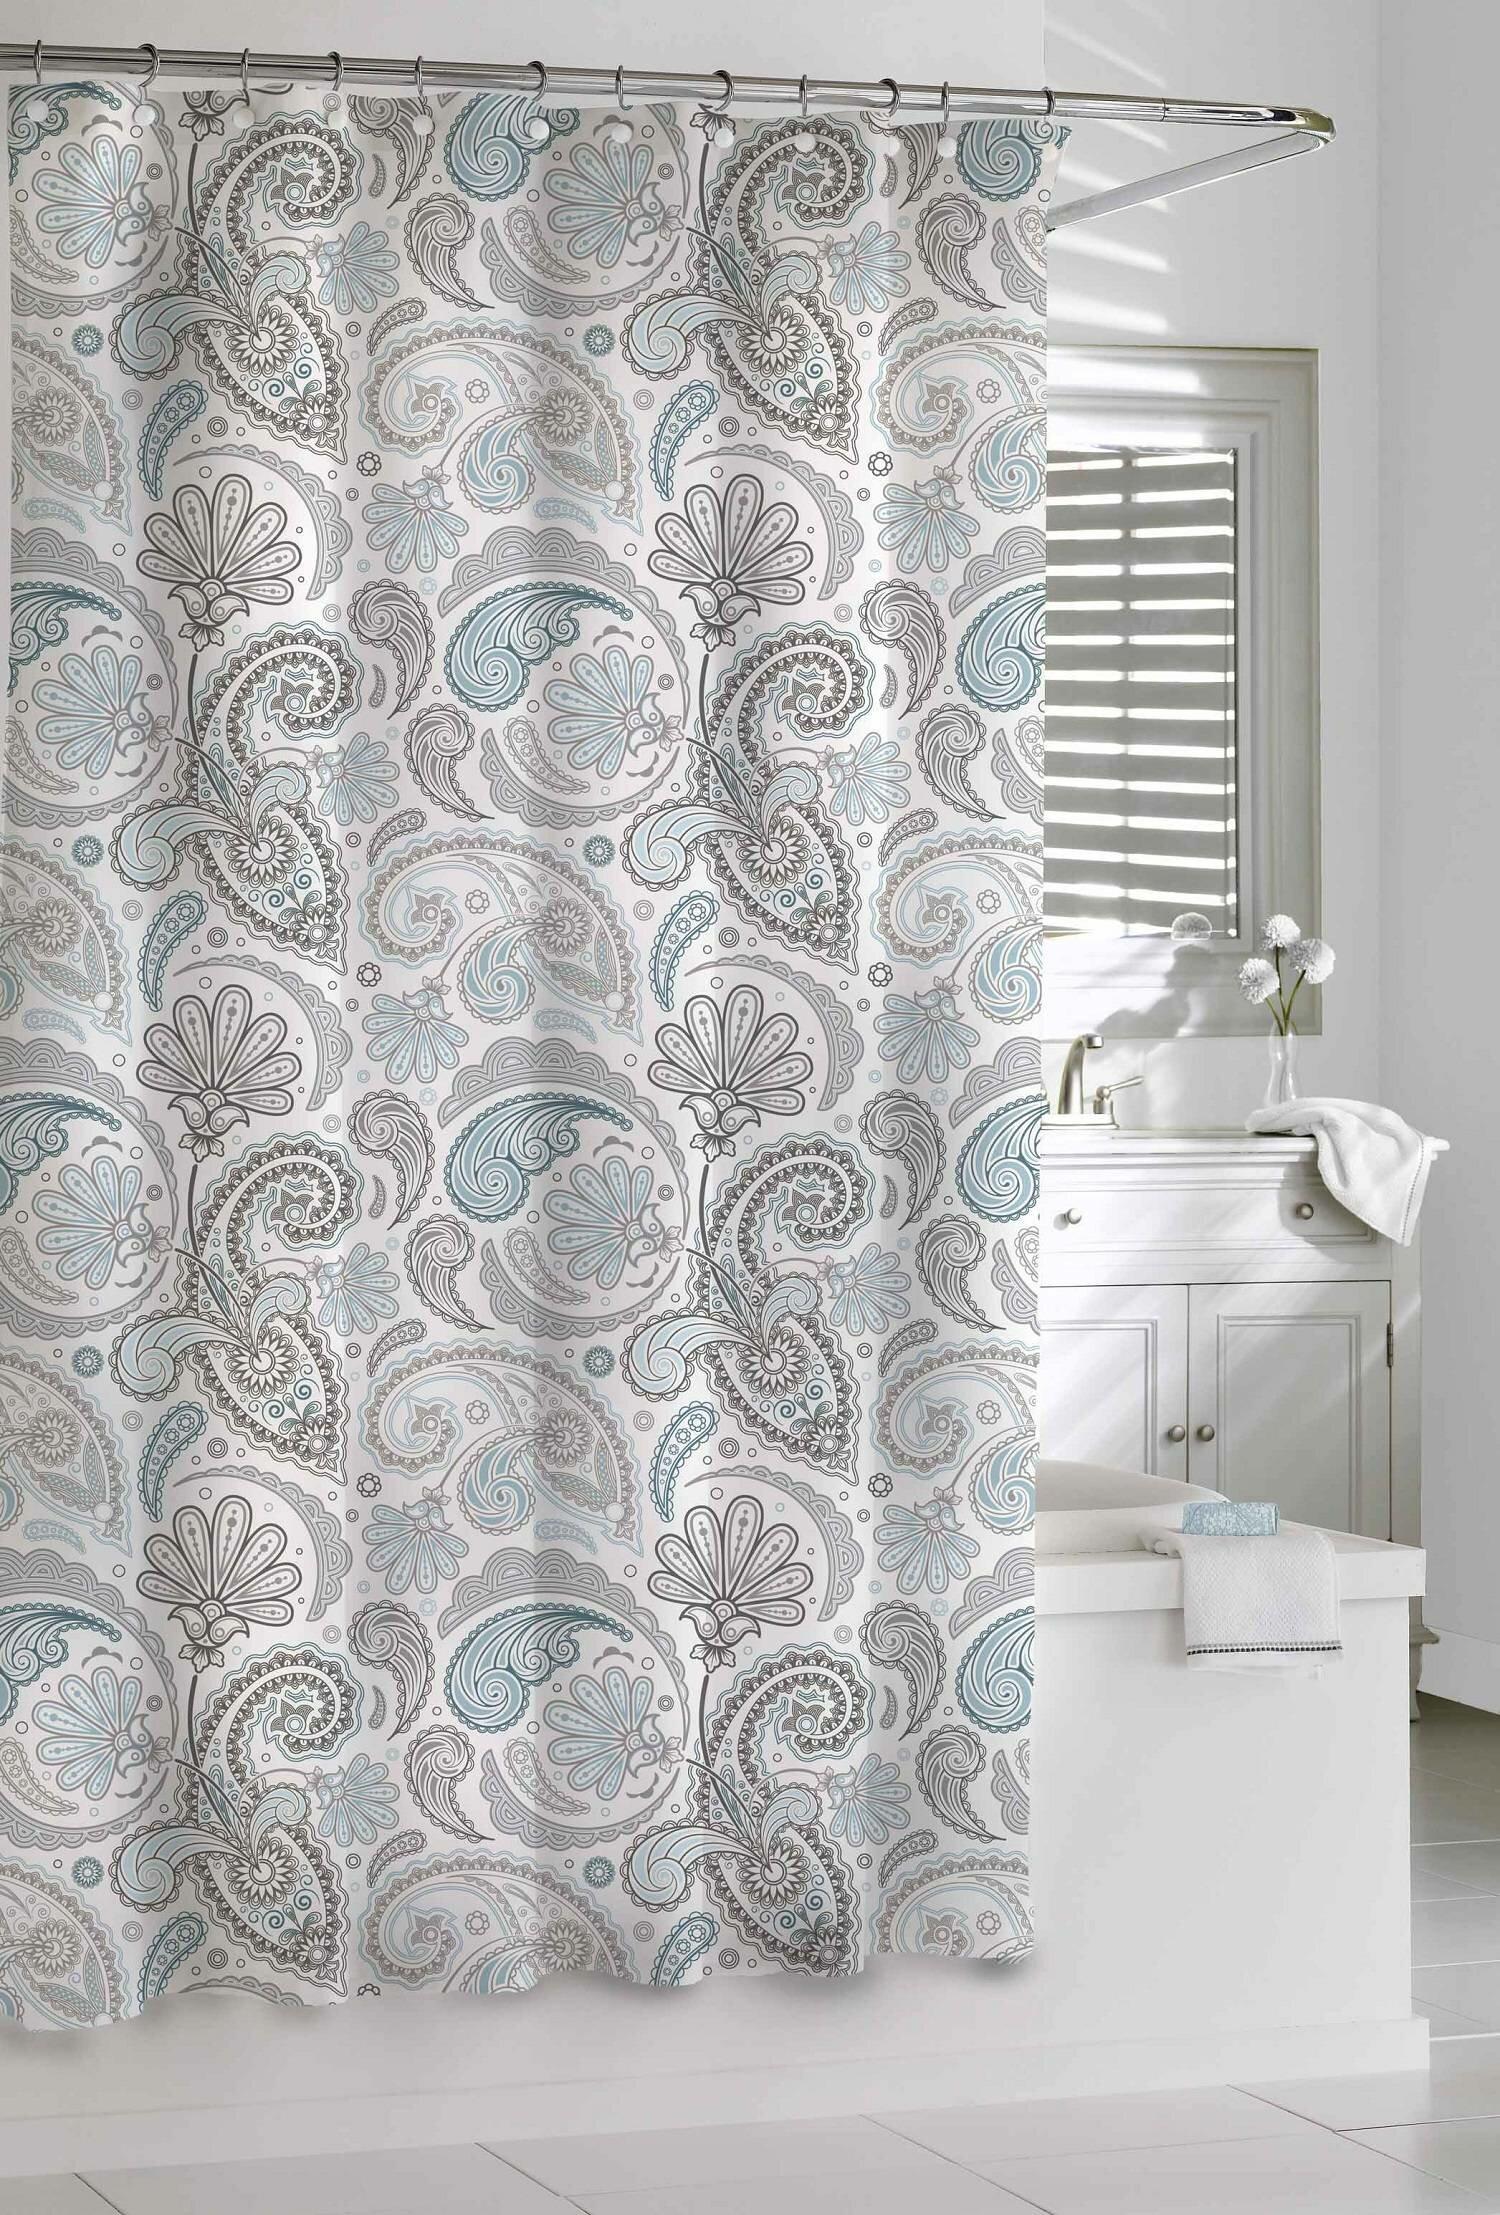 Aderyn Paisley 100 Cotton Single Shower Curtain